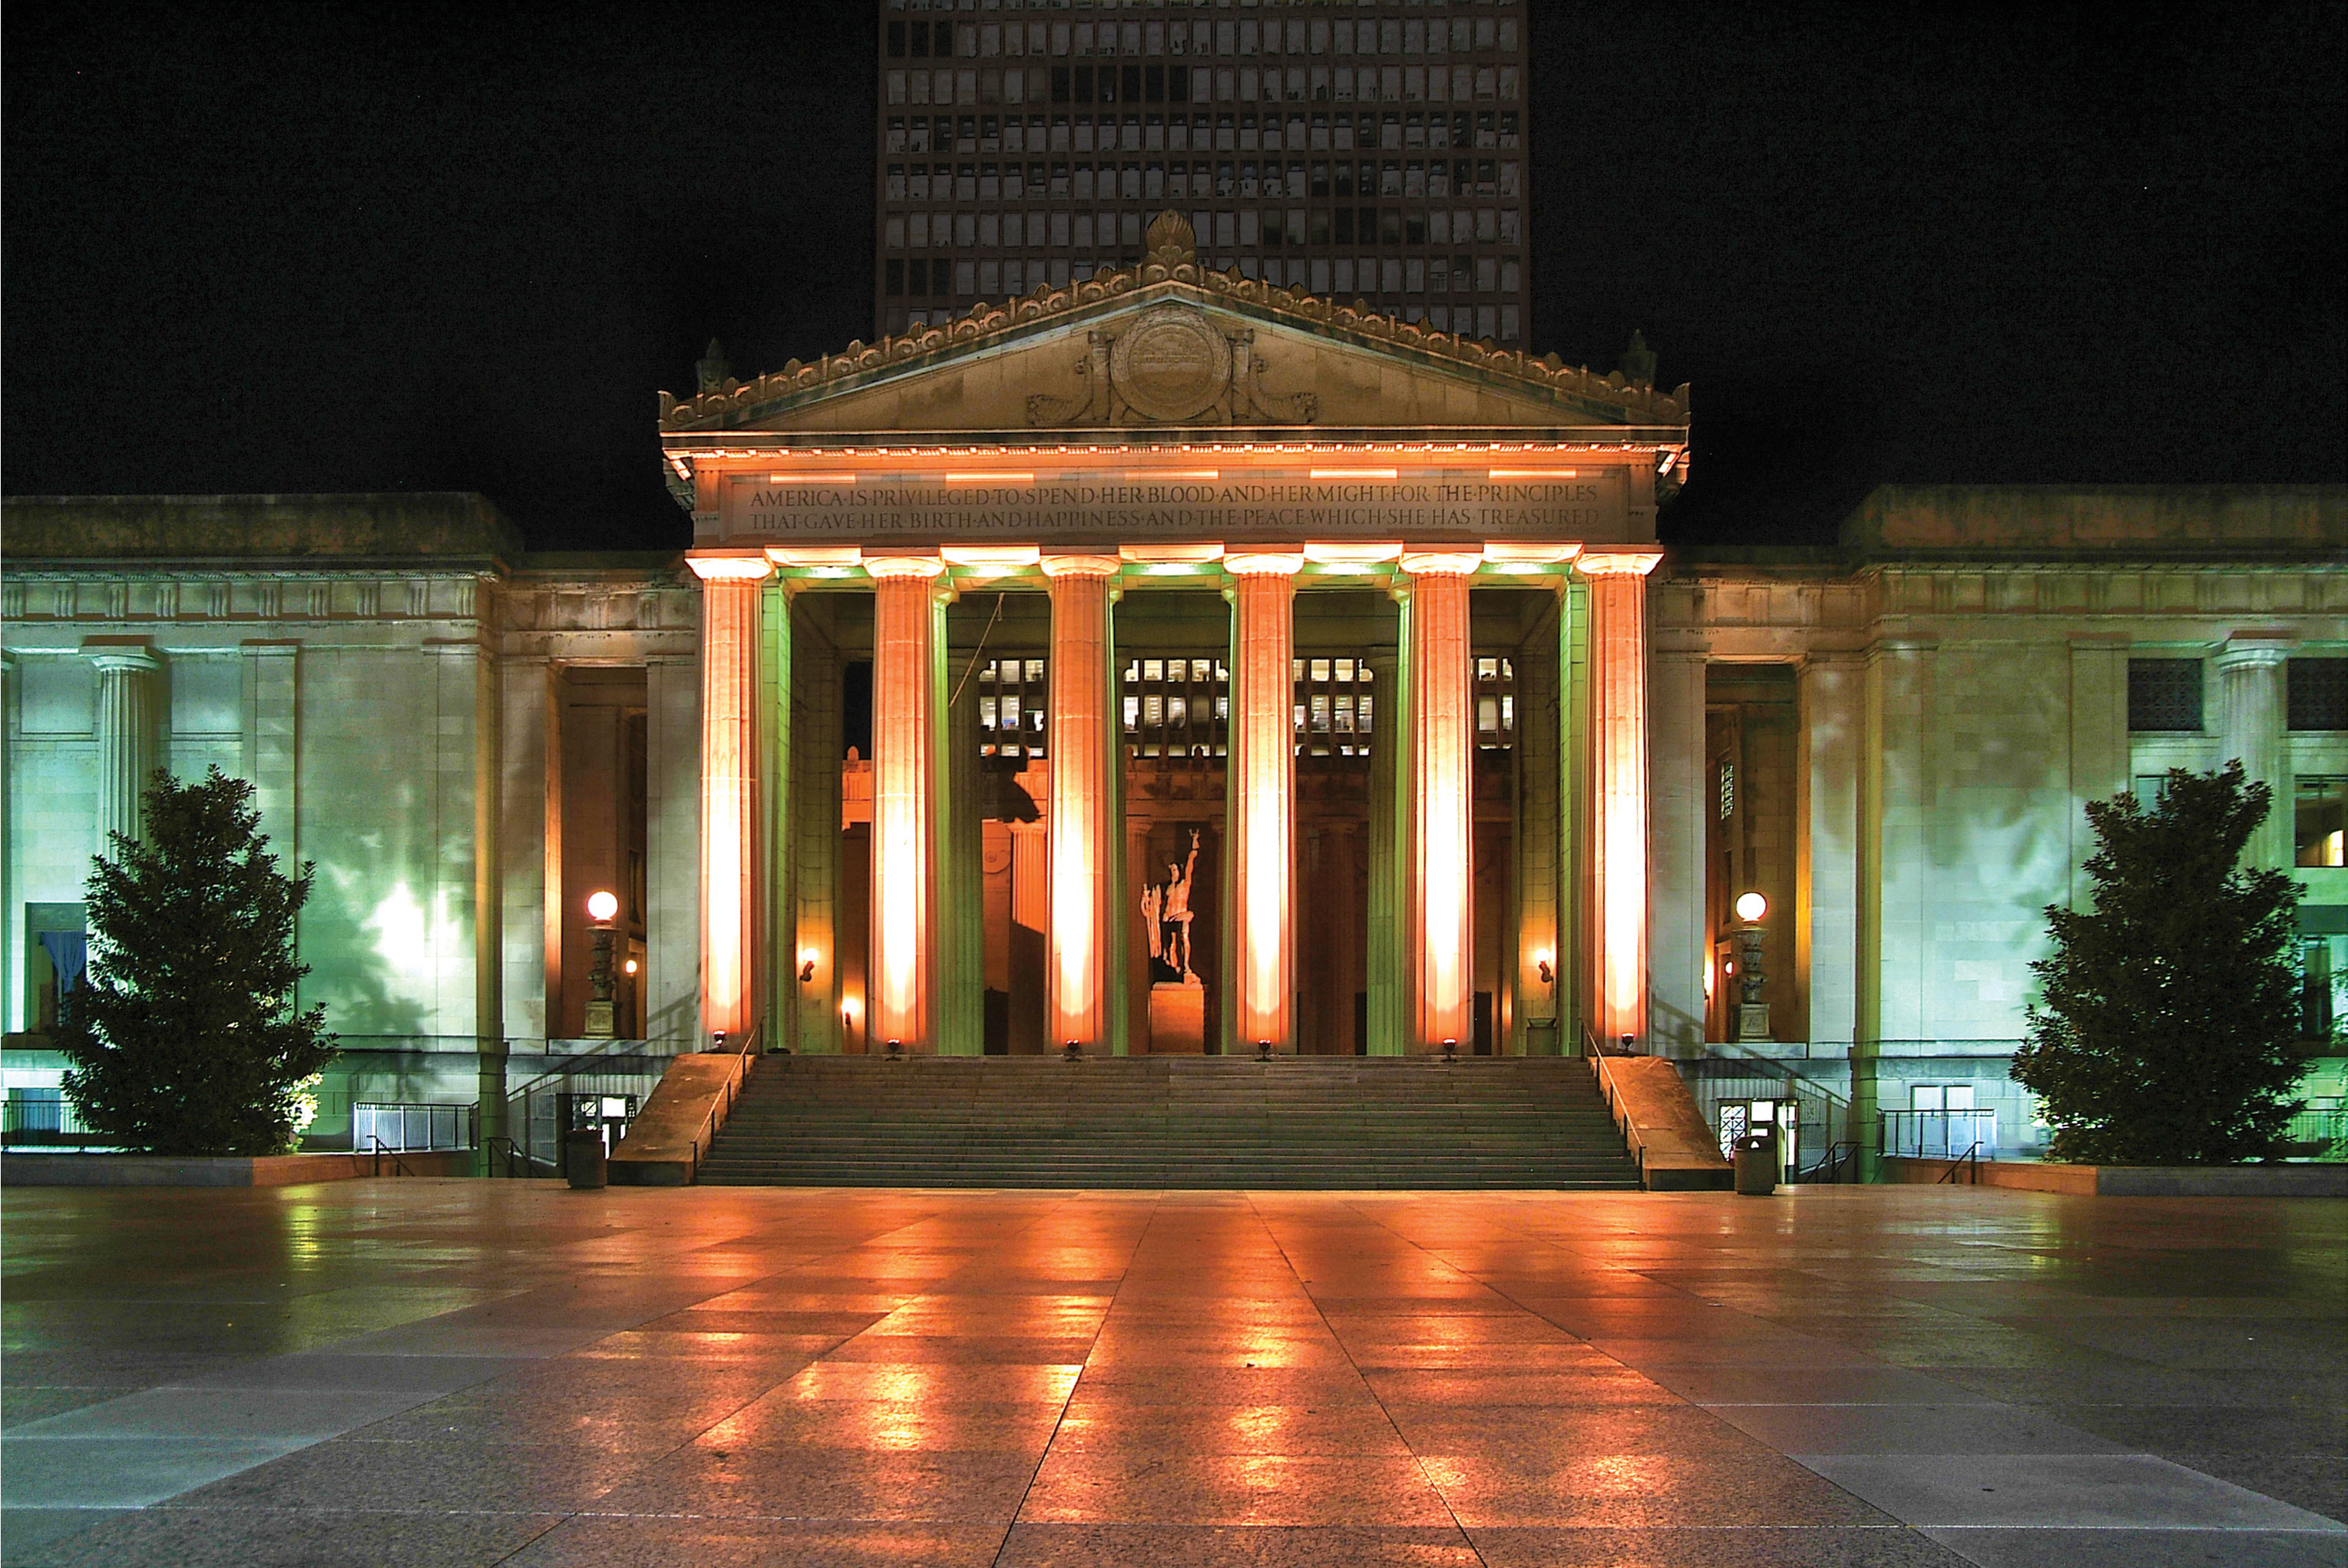 Front view of War Memorial Auditorium at night